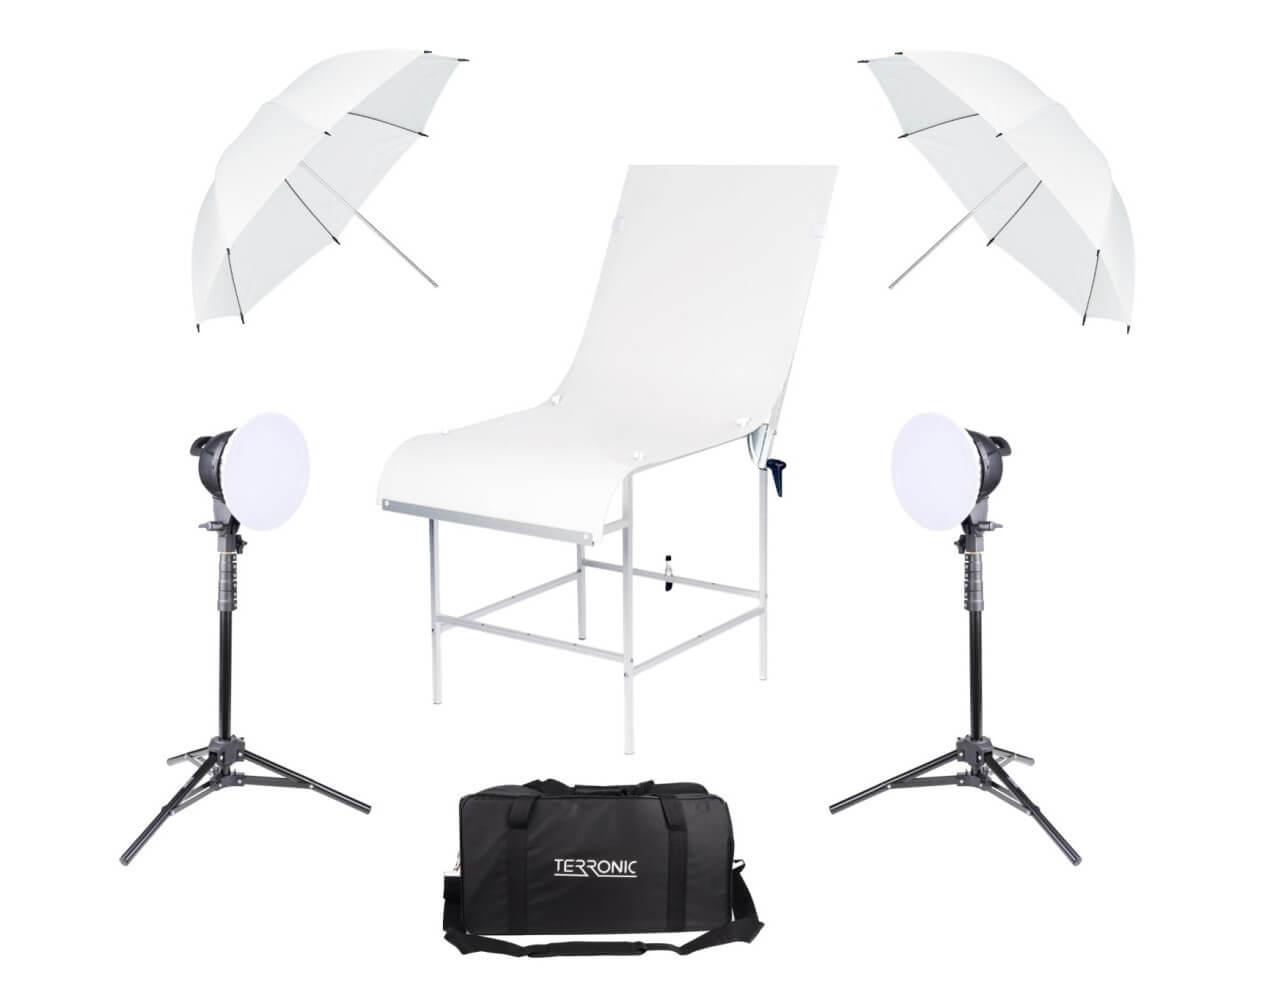 Terronic Basic Hobby LED 38/38 web studio | Zdroj foto Fomei